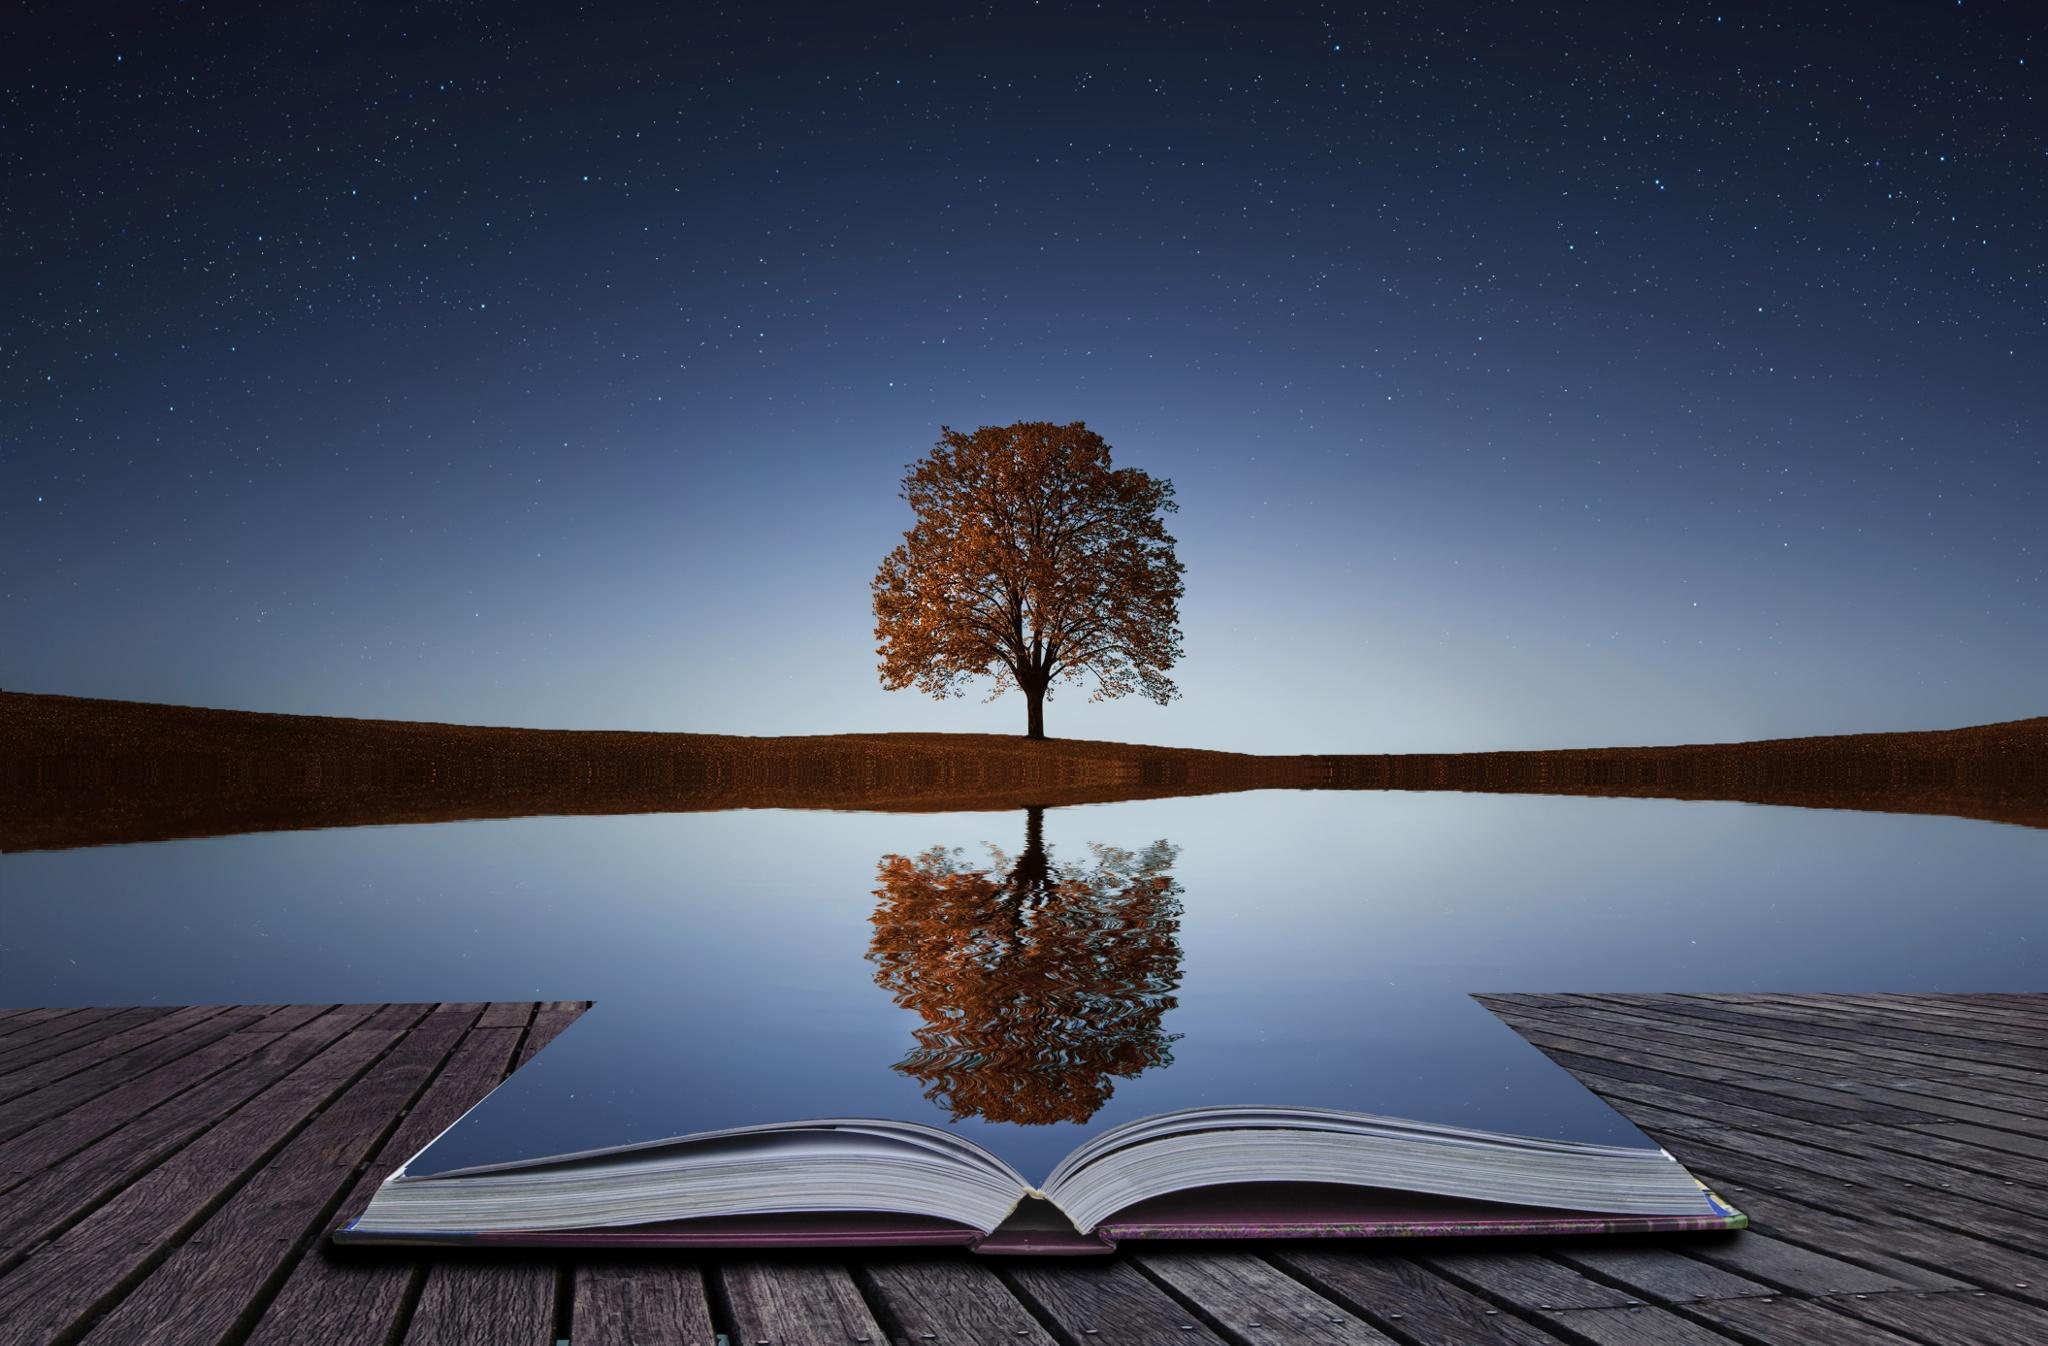 tree-reflection.jpg